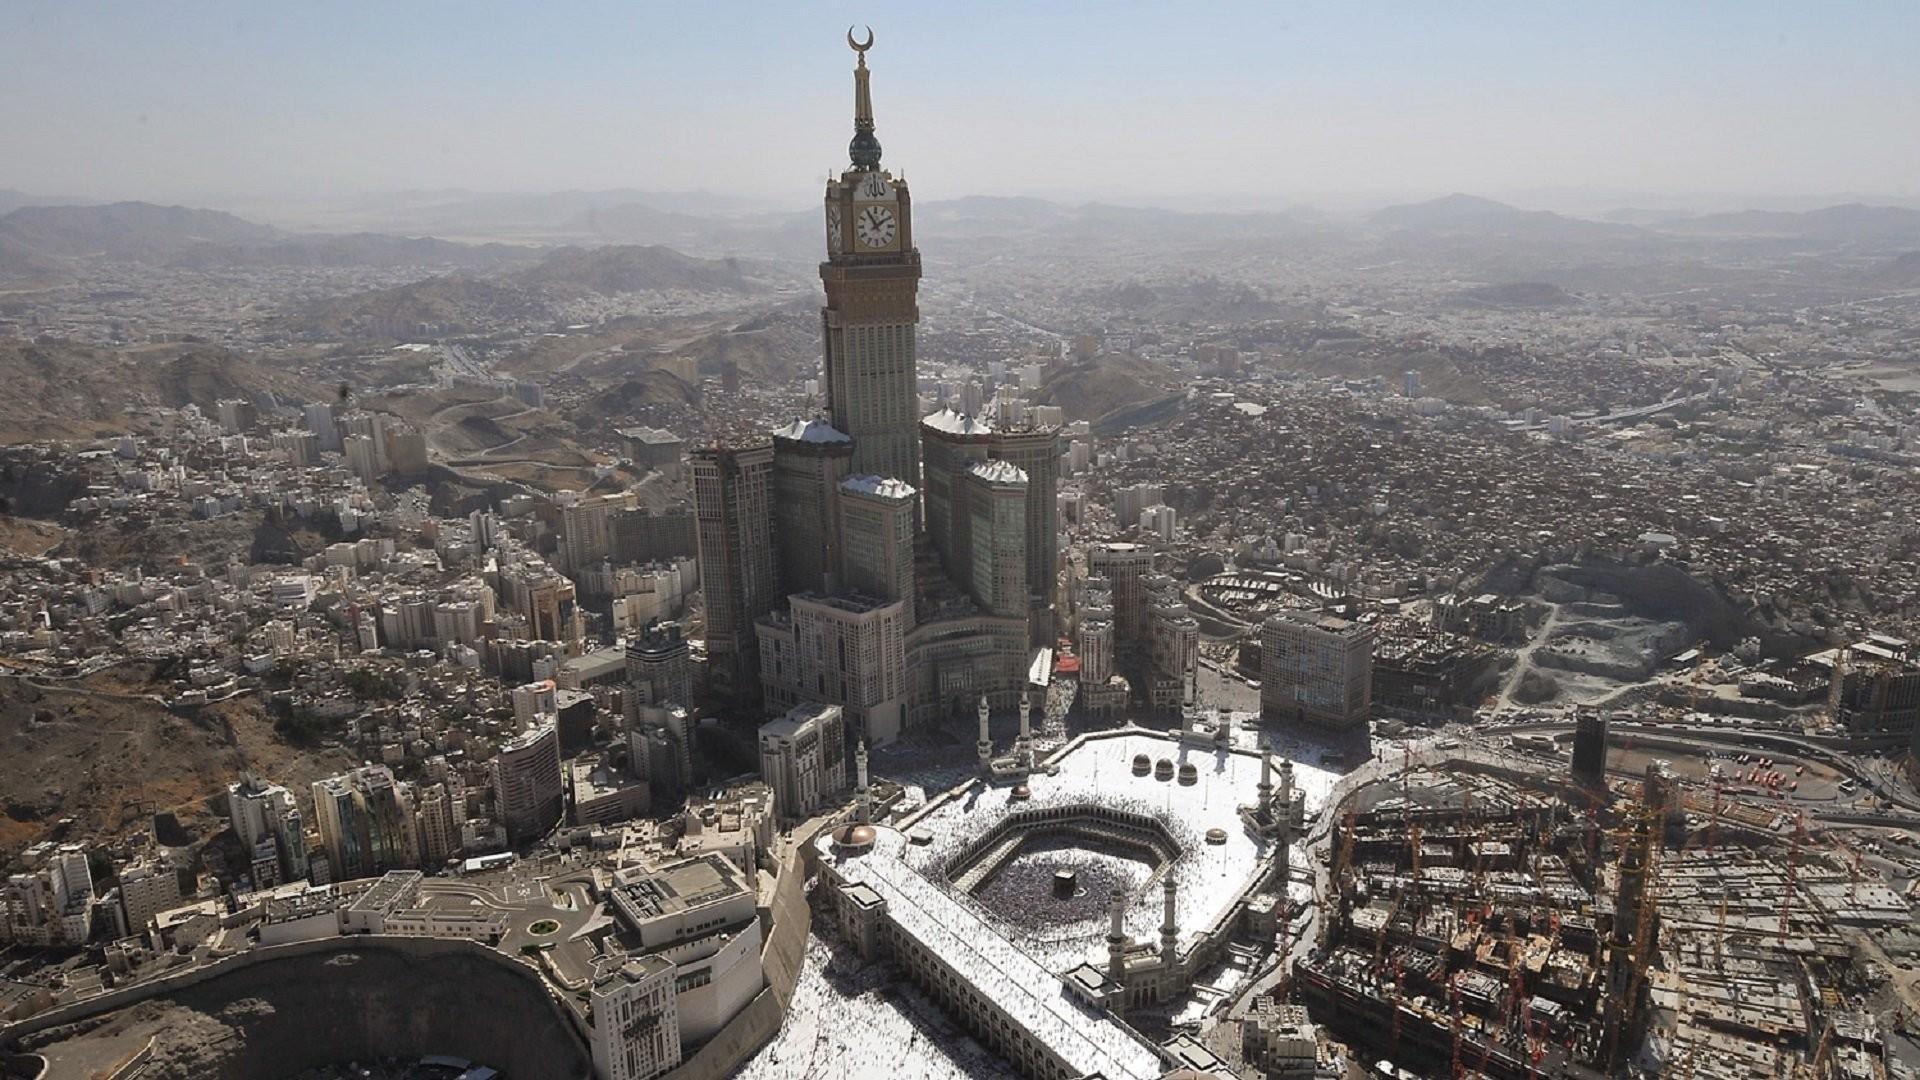 Mecca HD Wallpaper (70+ Images